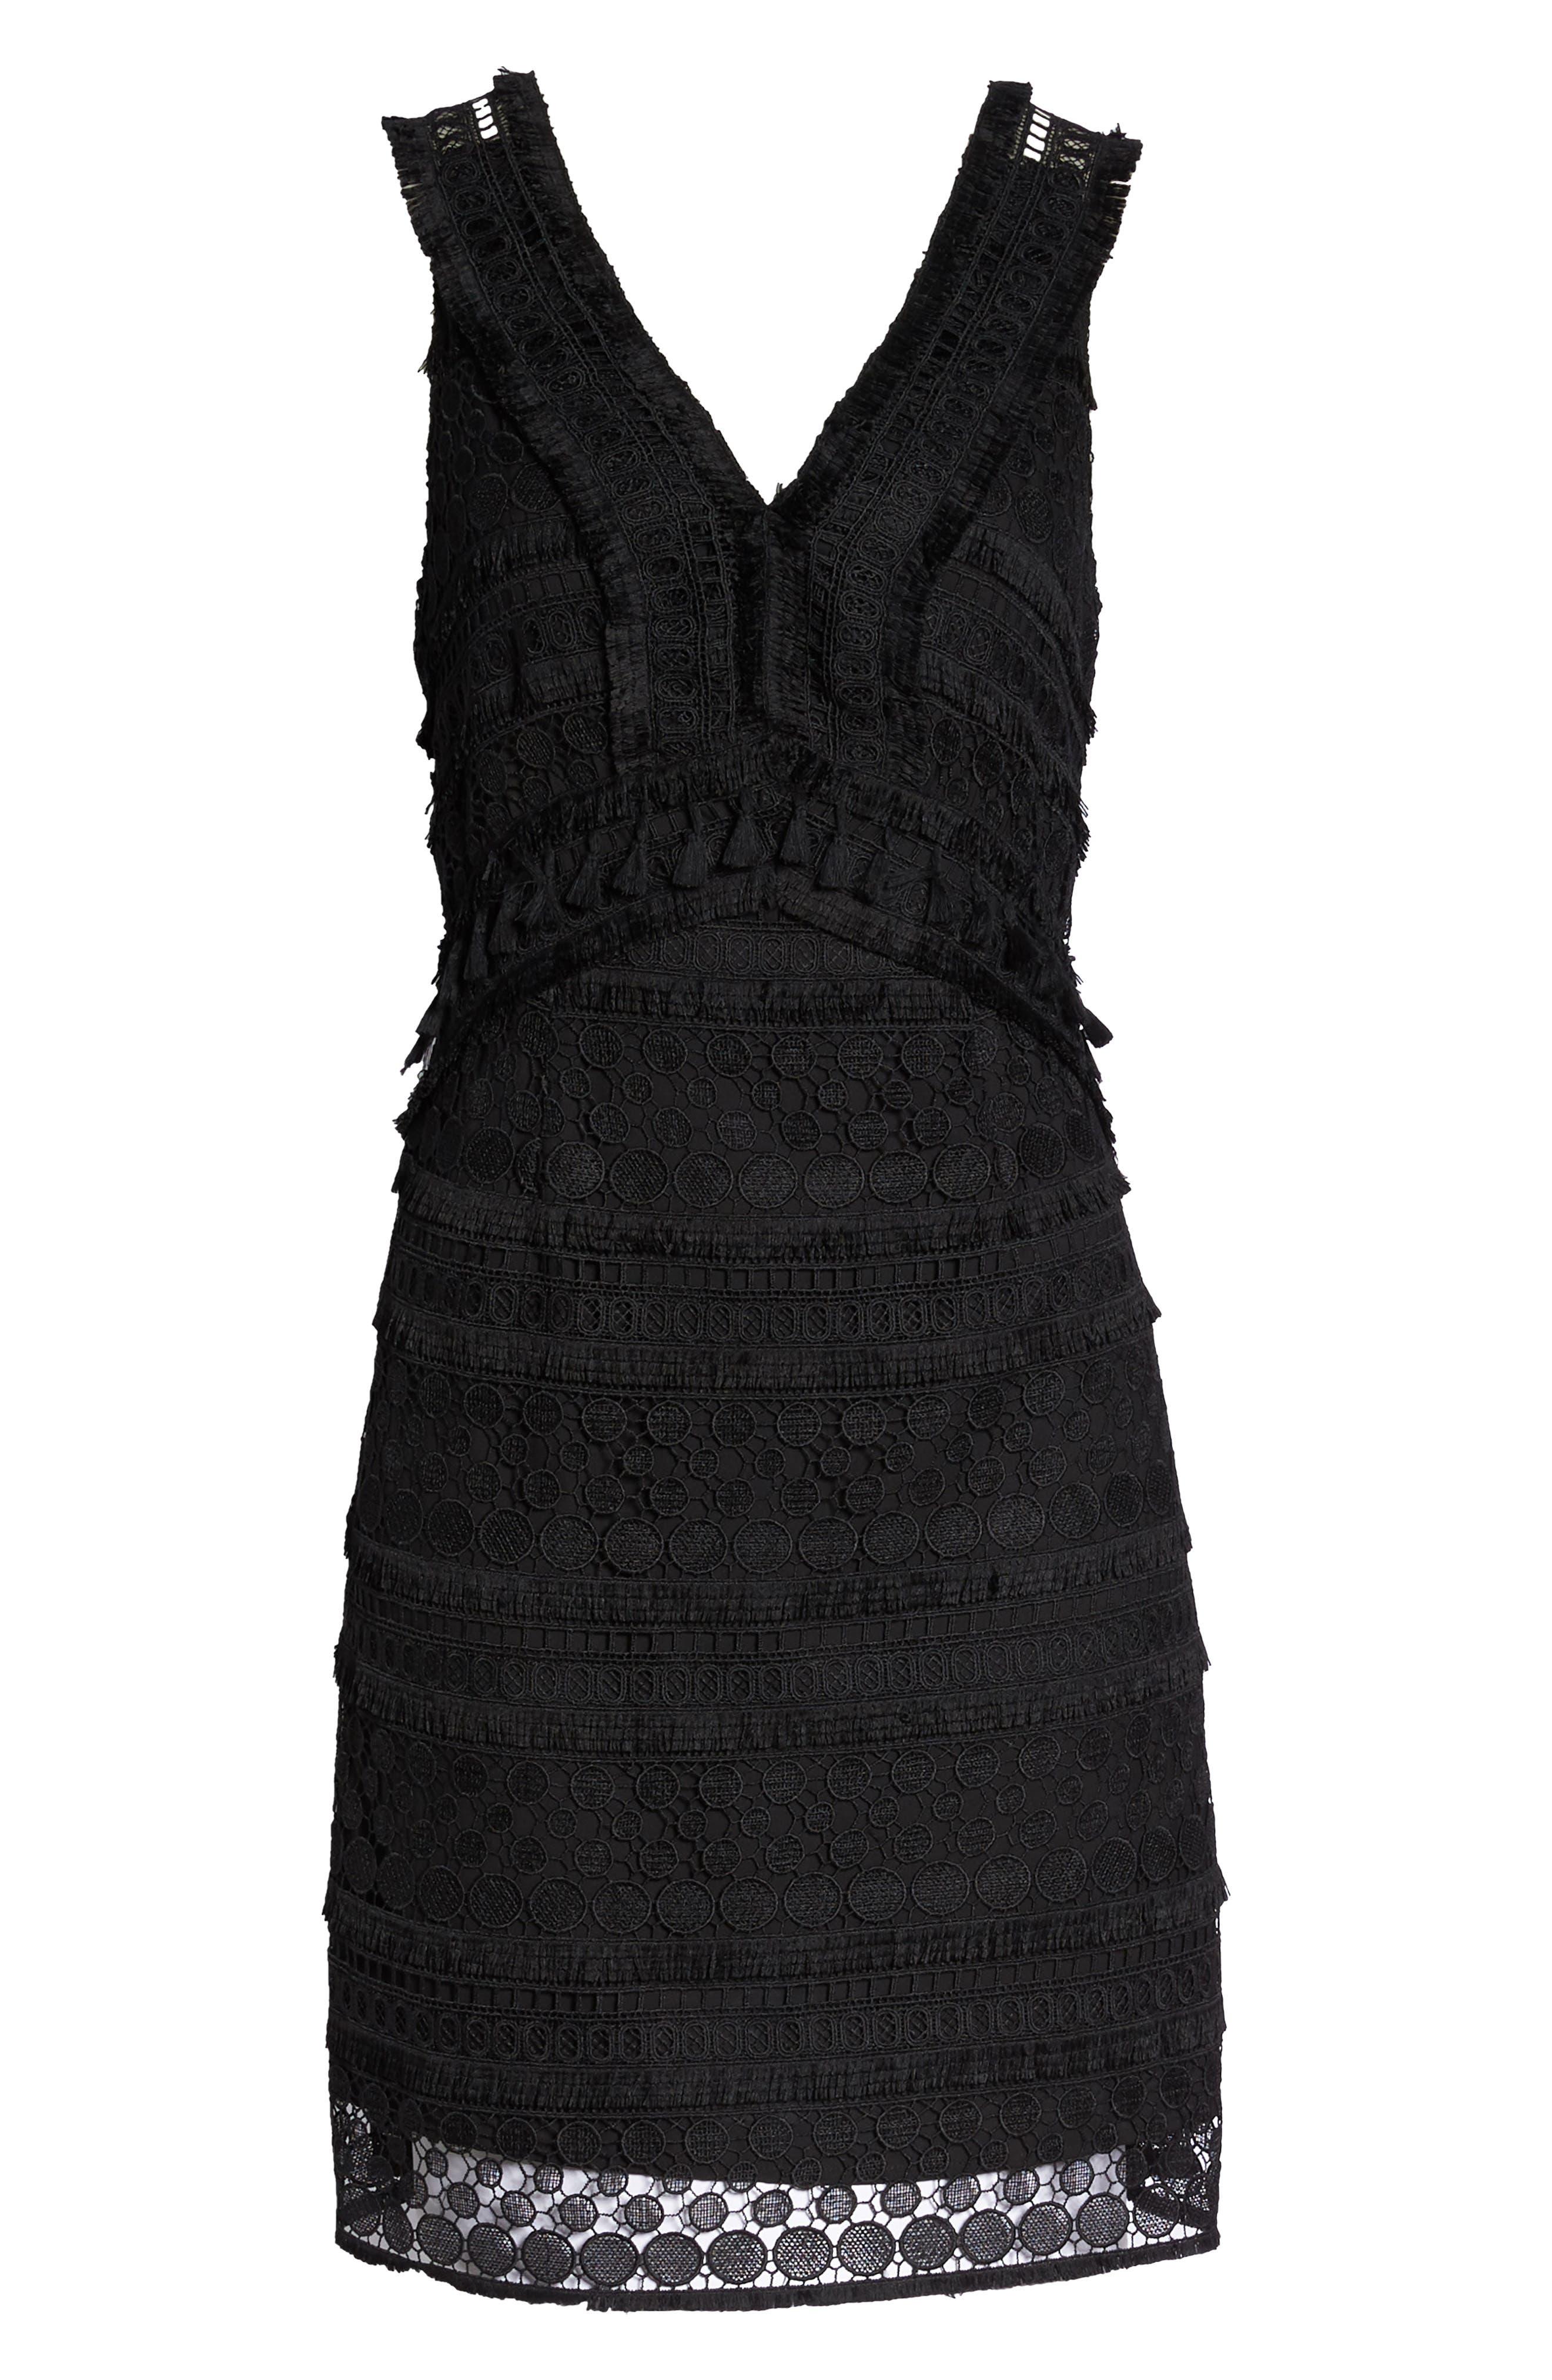 SAM EDELMAN, Lace Sheath Dress, Alternate thumbnail 7, color, 001